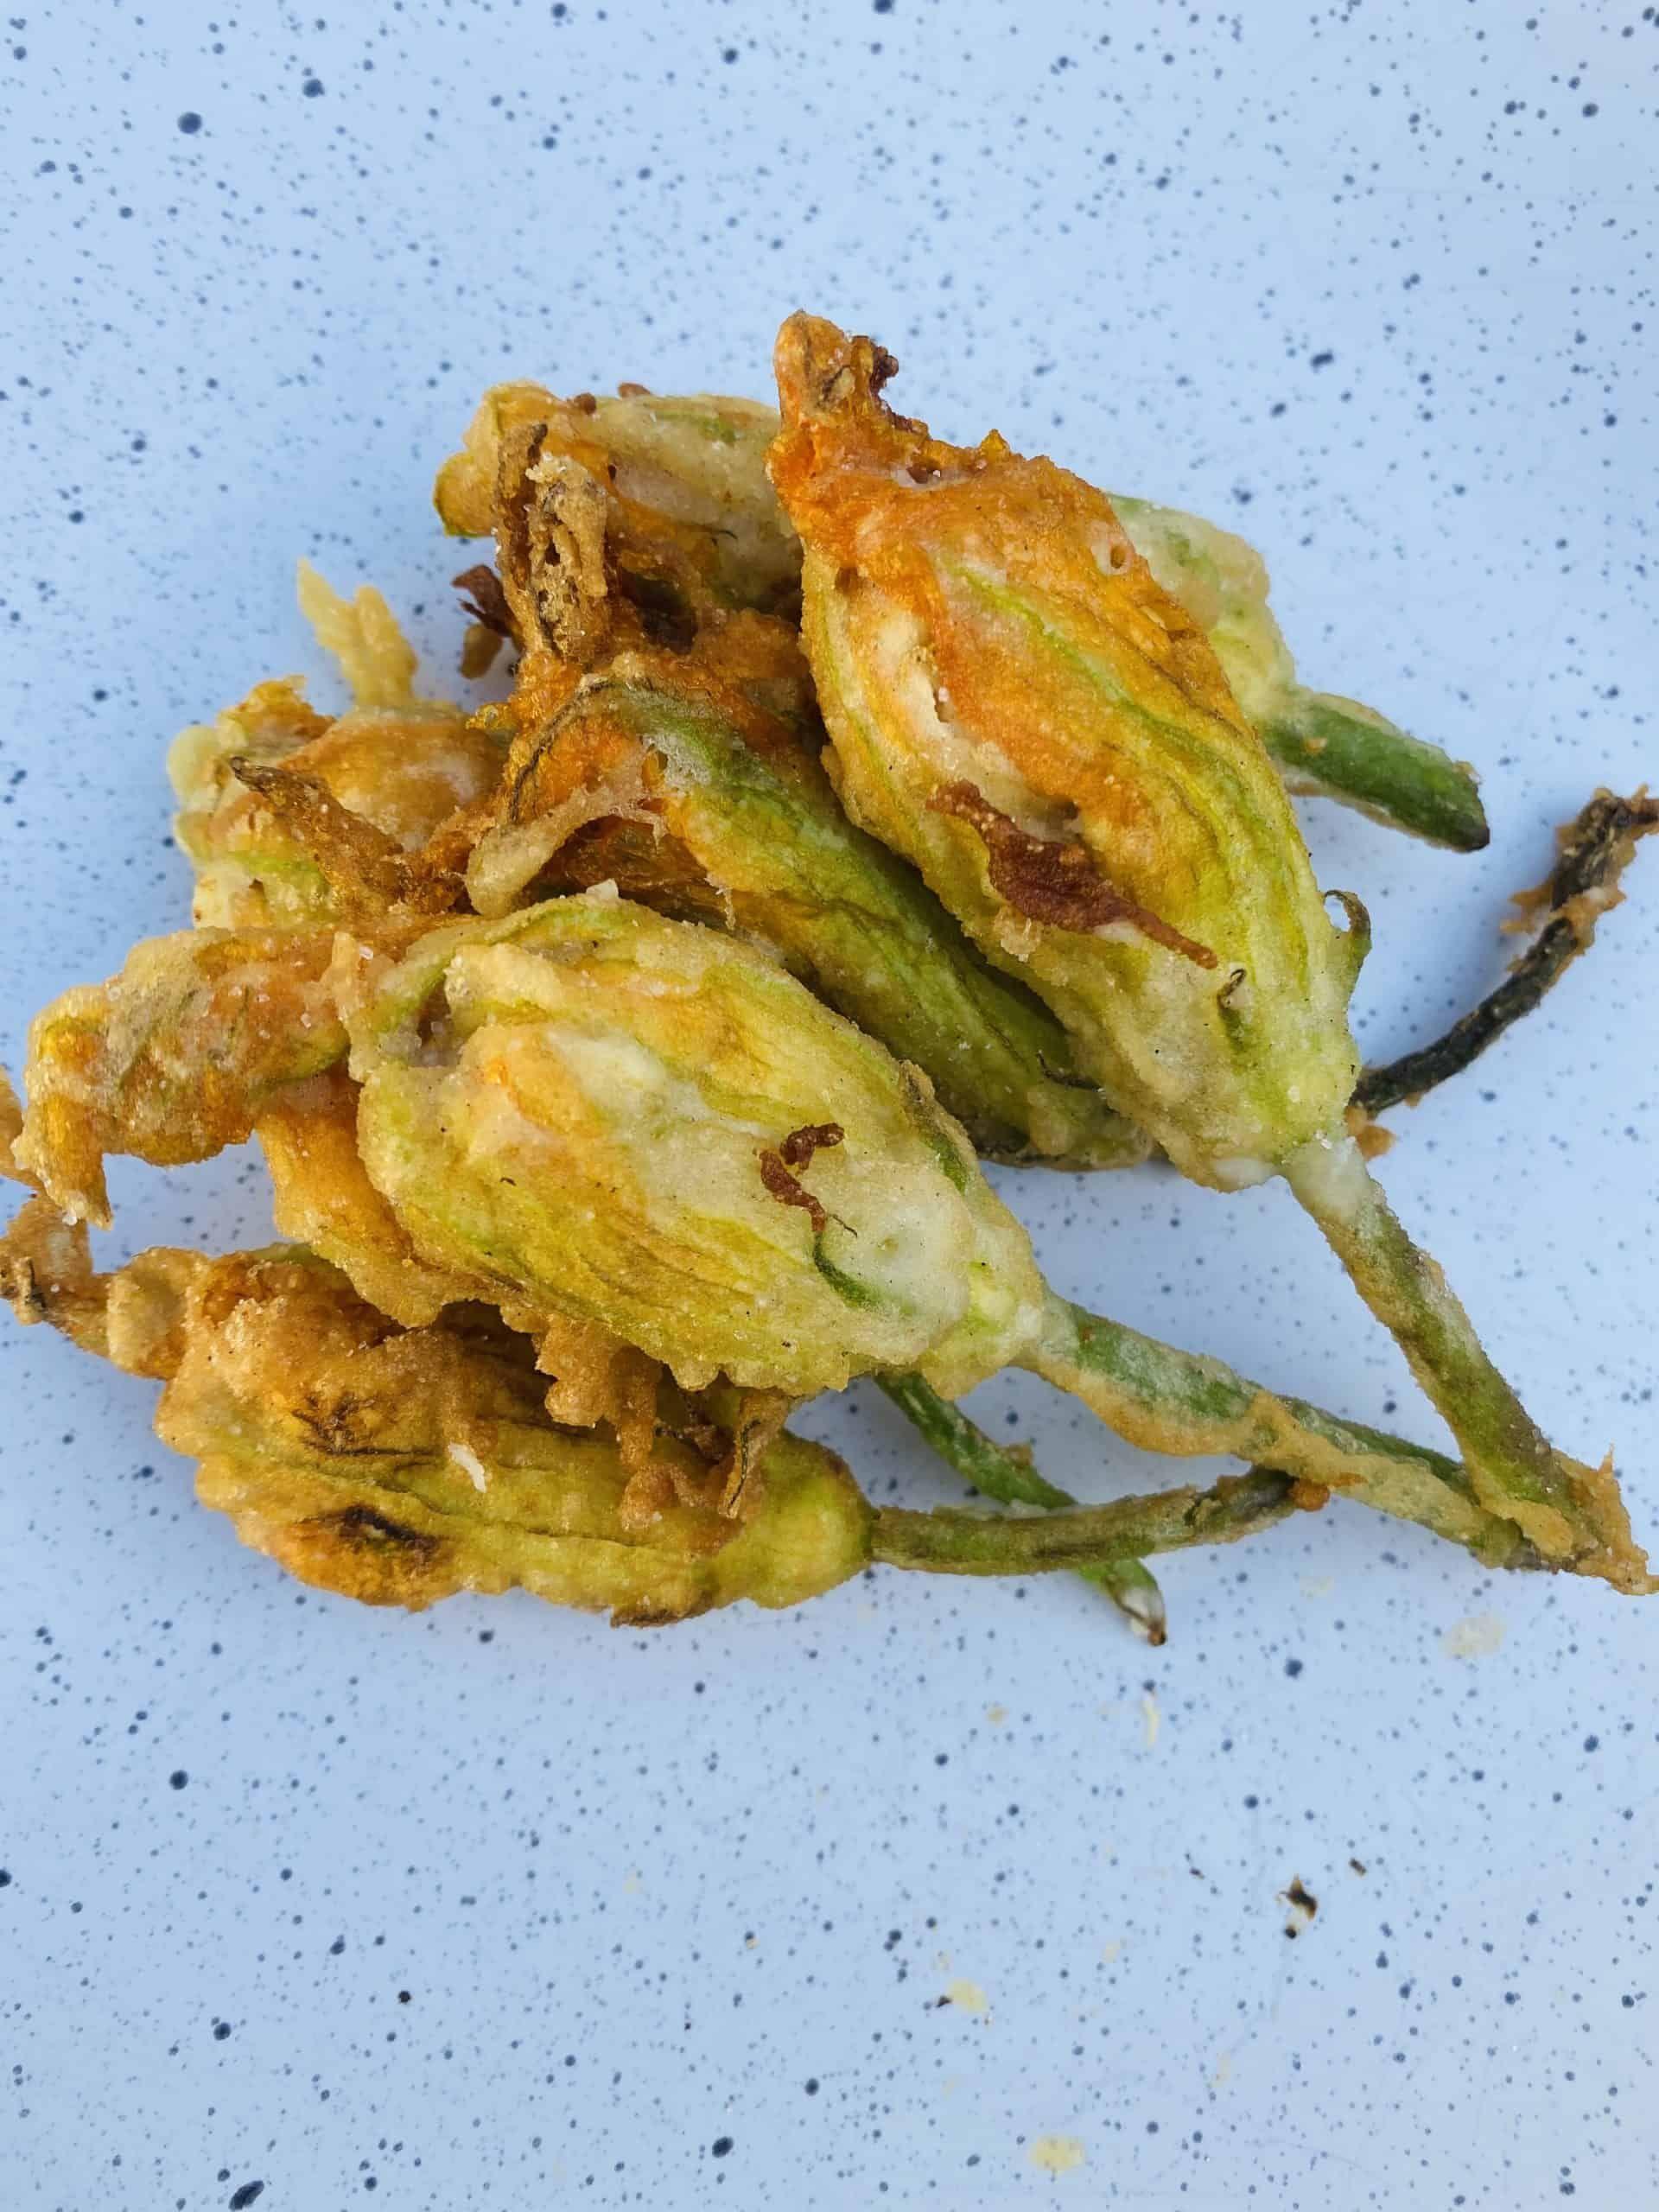 Photo of Crispy Stuffed Zucchini Flowers with Ricotta and walnuts